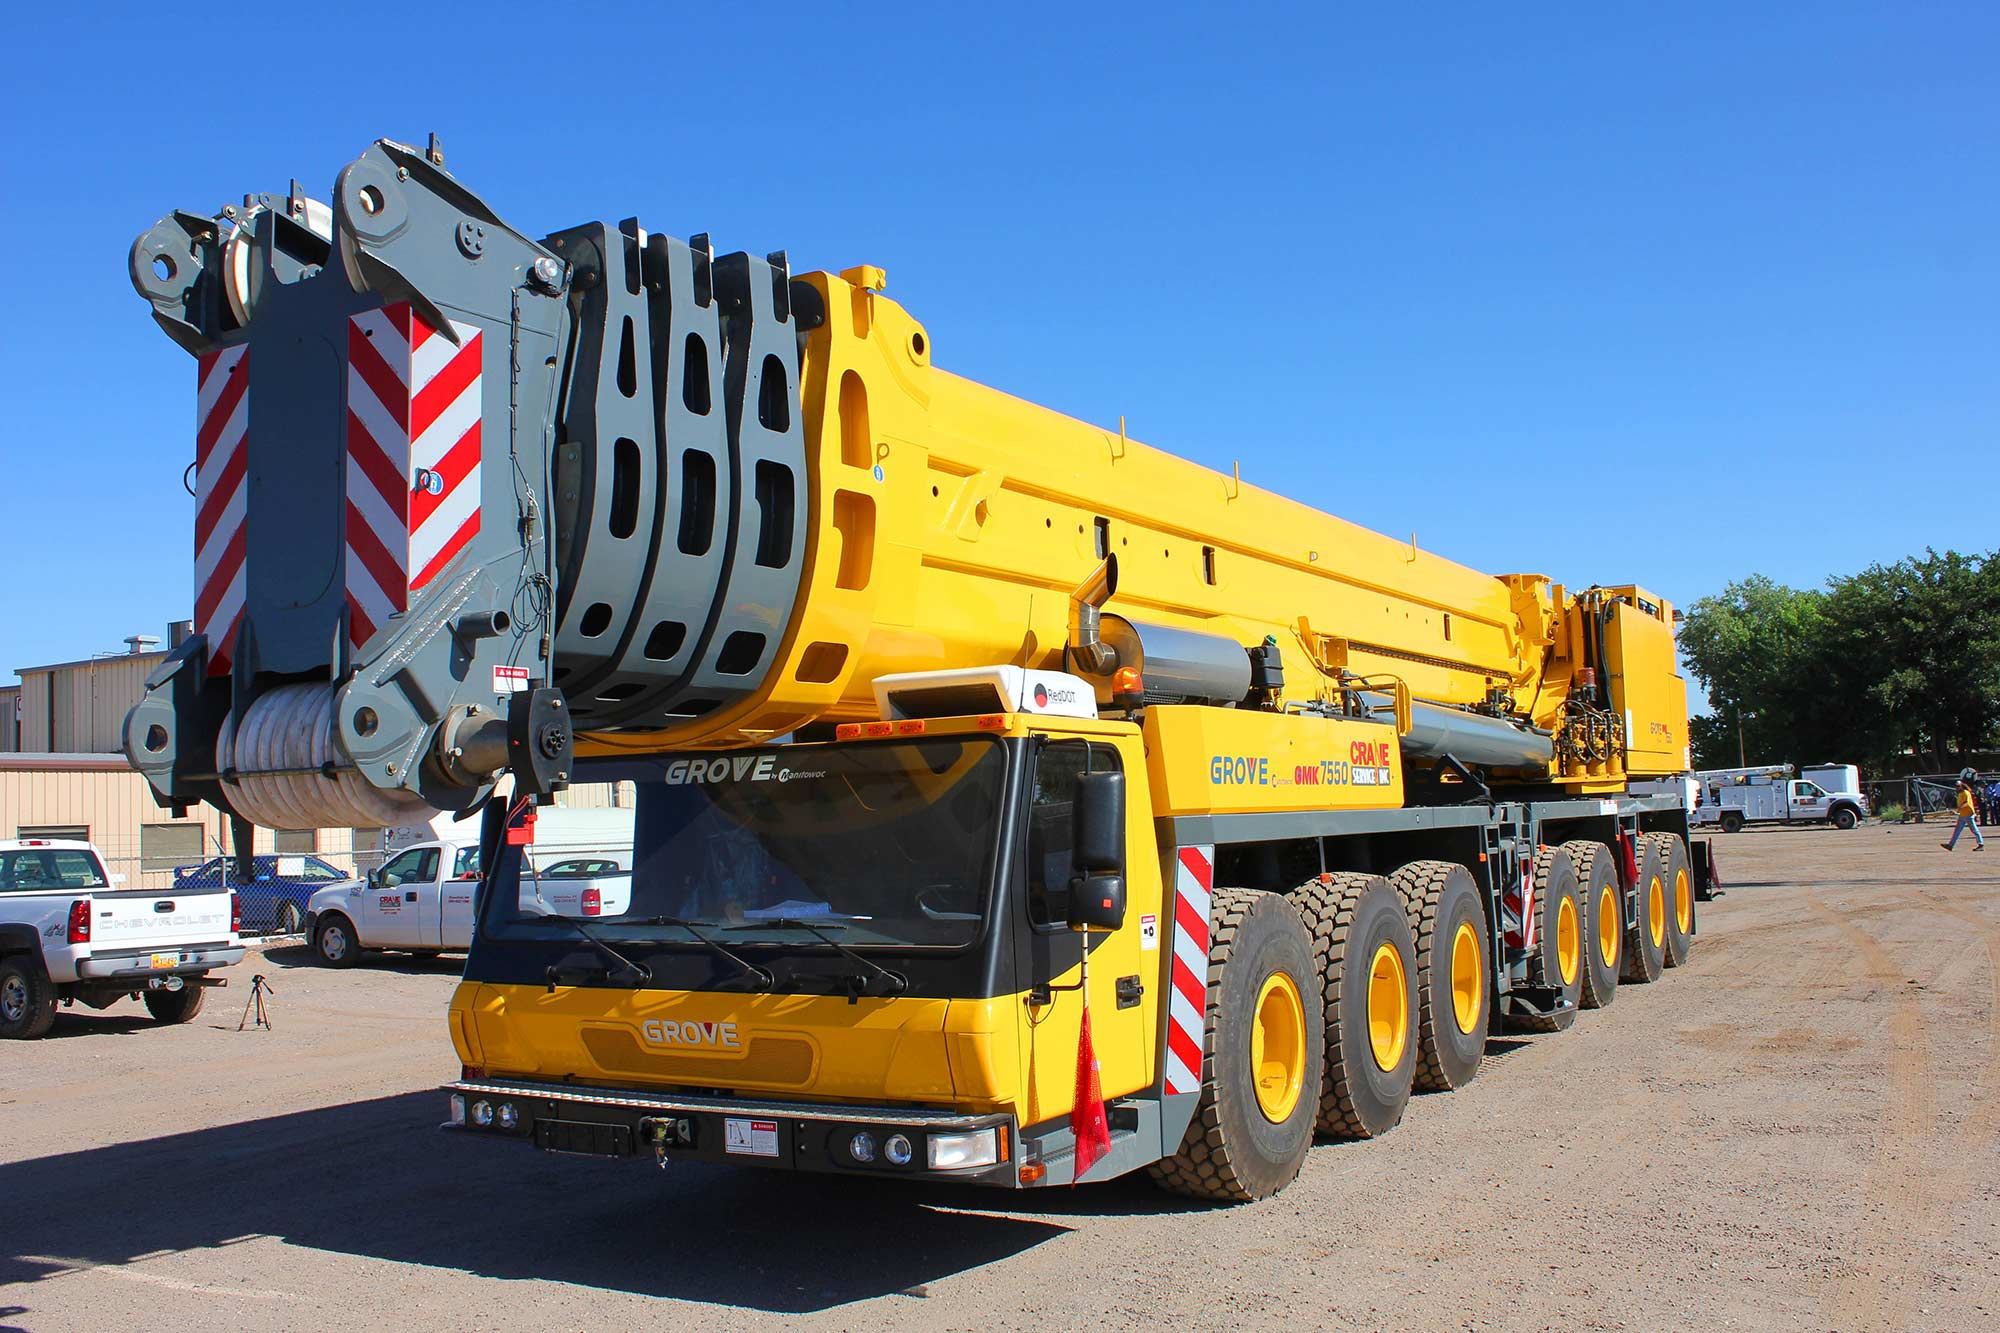 Manned equipment d d kerns construction co inc for Crane grove